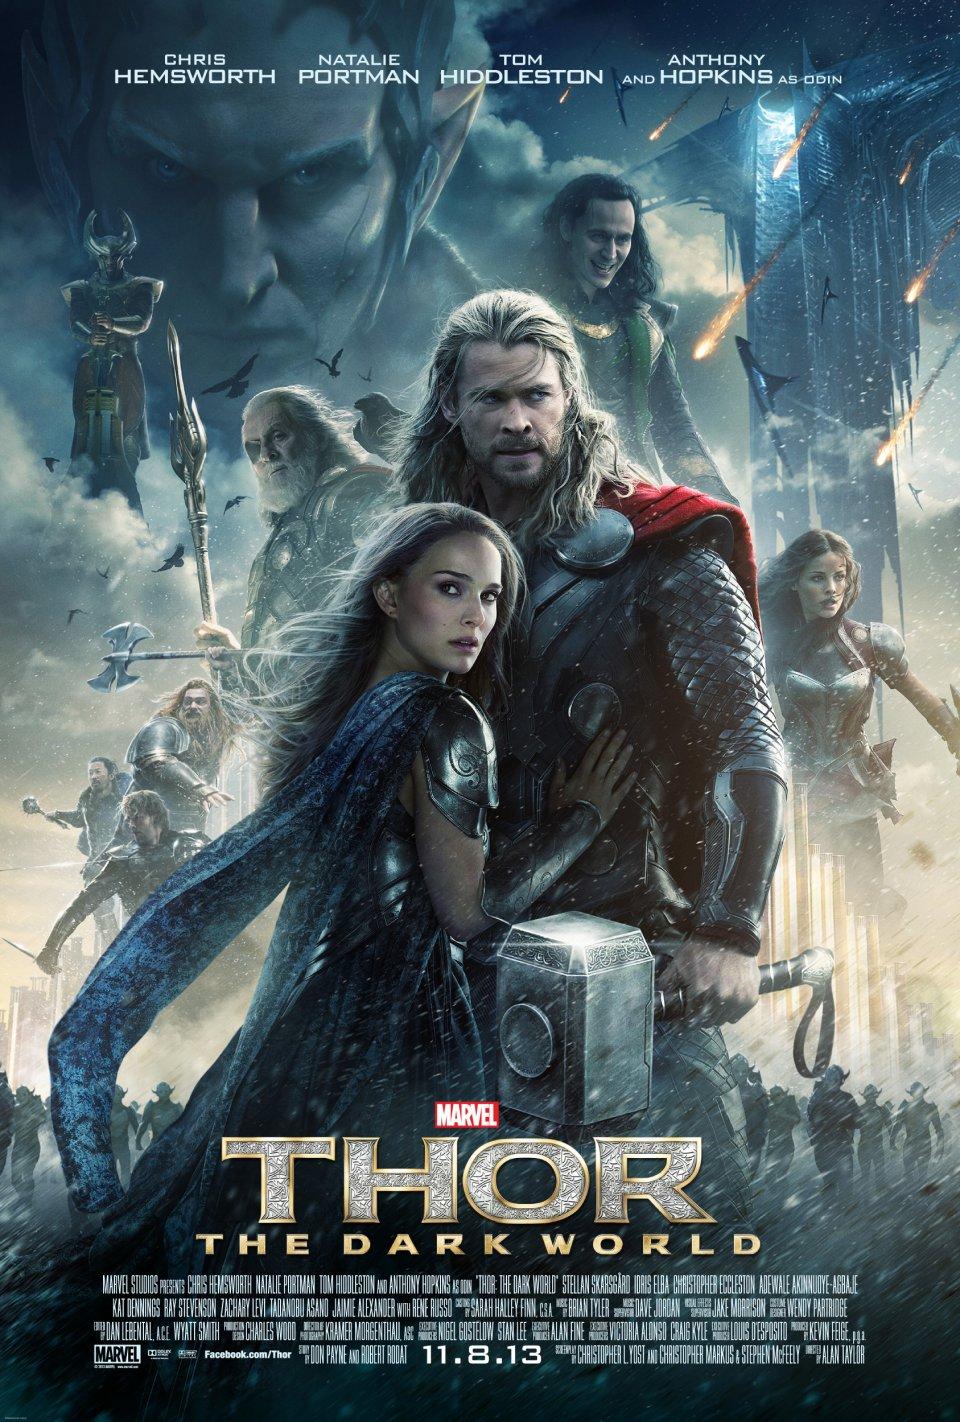 Thor: The Dark World Has Strong Characterization, Lacks Adventure